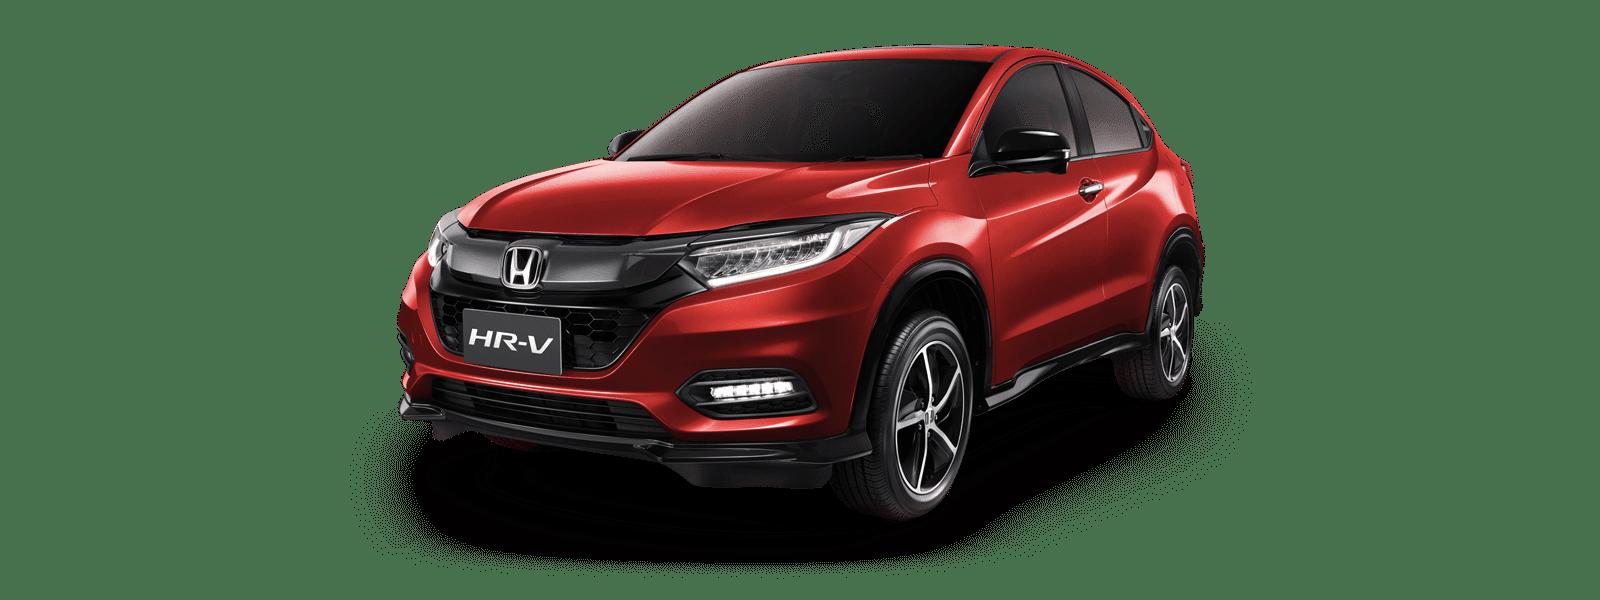 3. Honda HR-V 2021 รุ่น RS ราคา 1,119,000 บาท